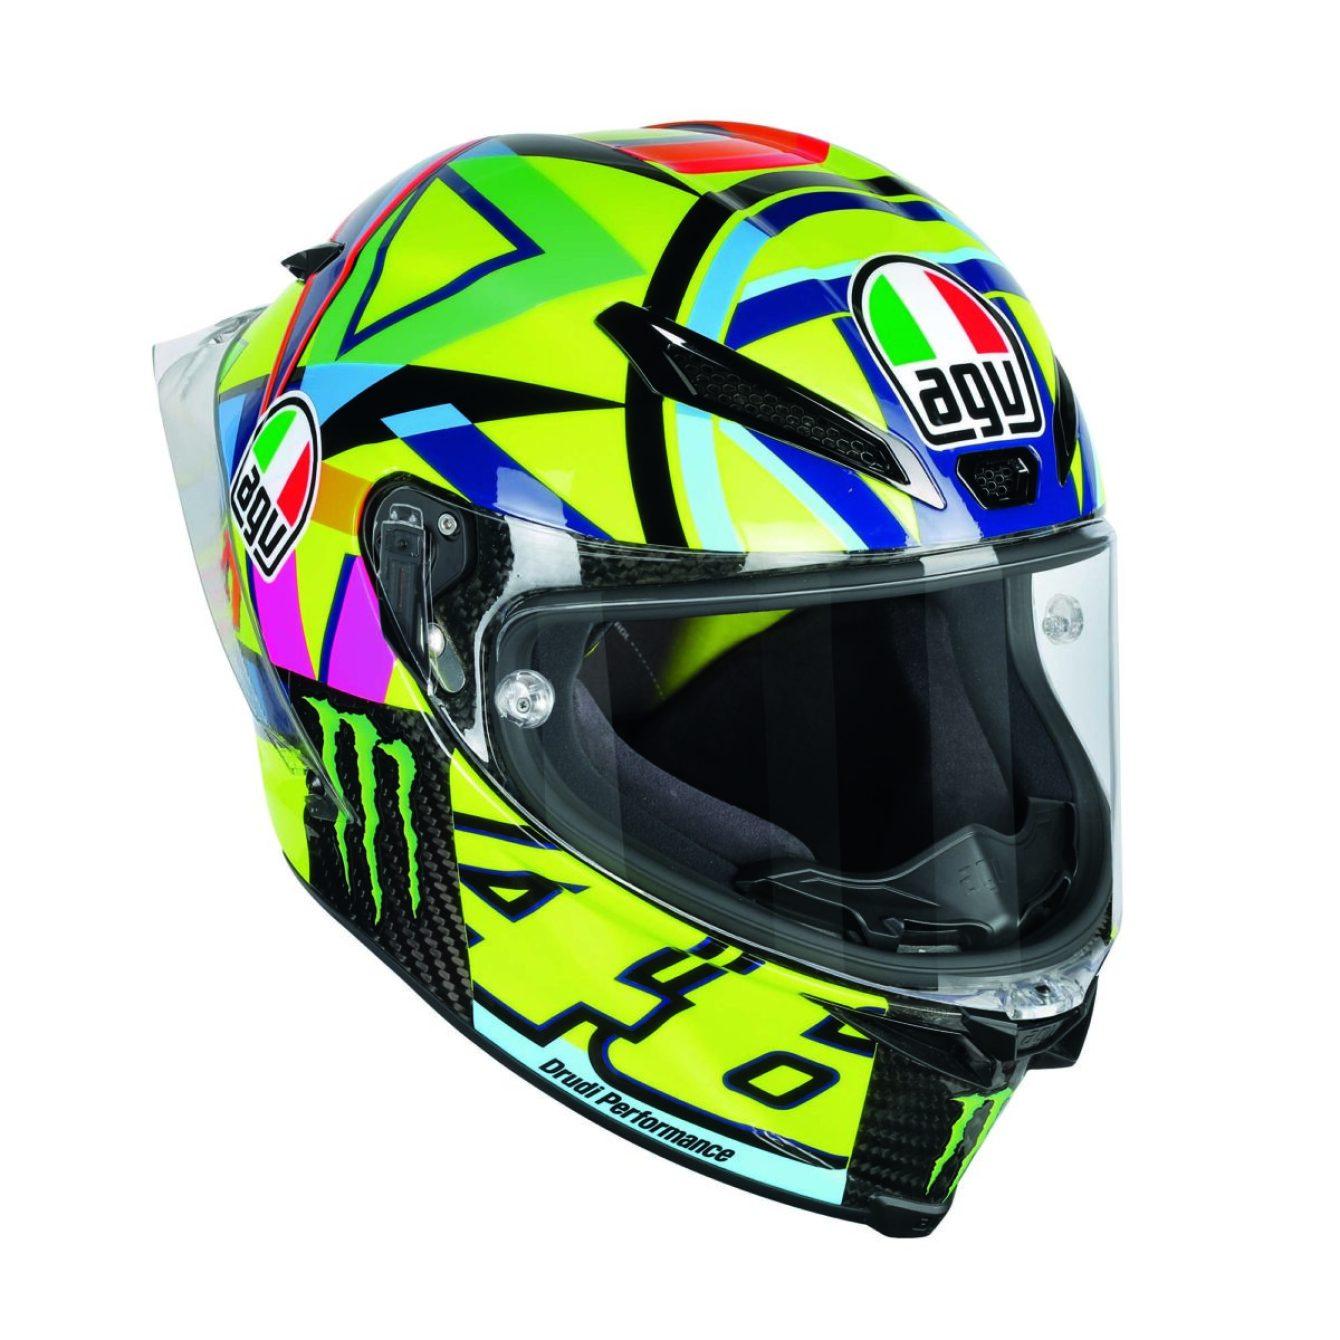 agv-pista-gp-r-race-helmet-12